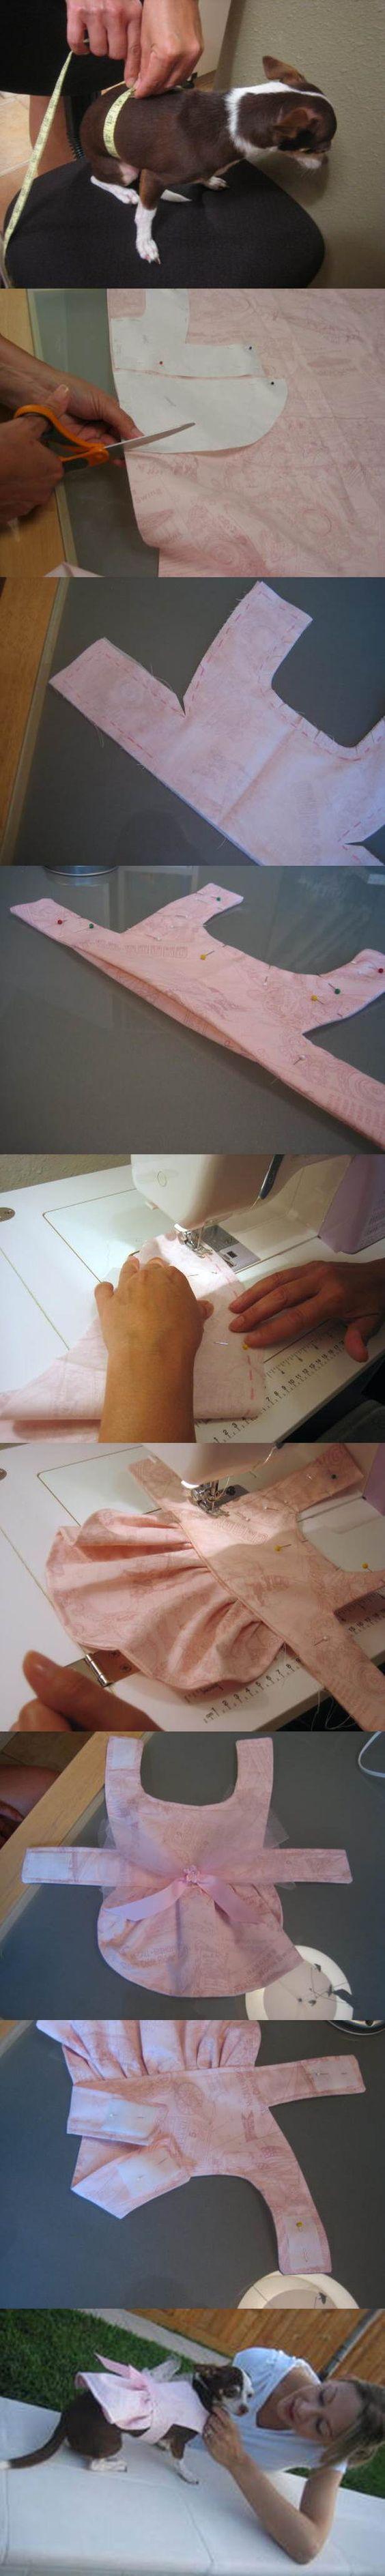 DIY Pink Stylish Dog Dress 2: